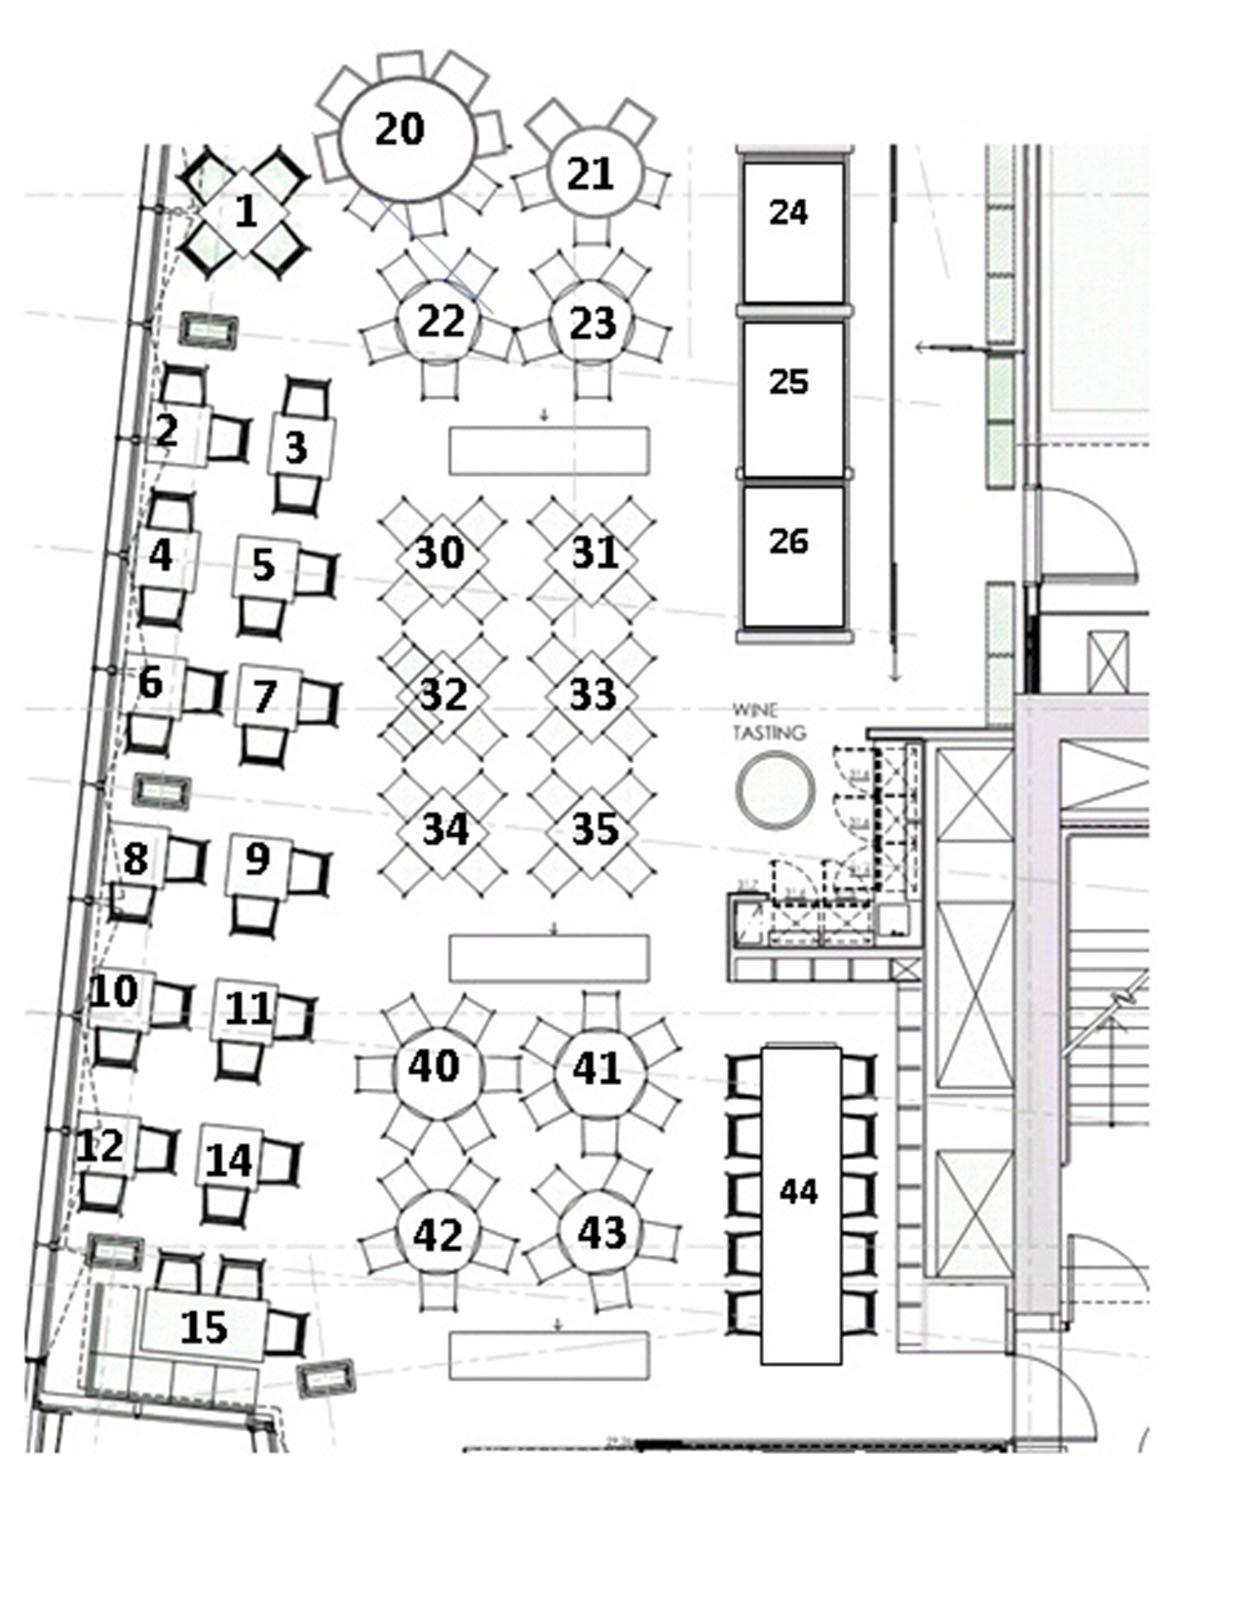 Oblix Restaurant L33 Engine Diagram Show Captions